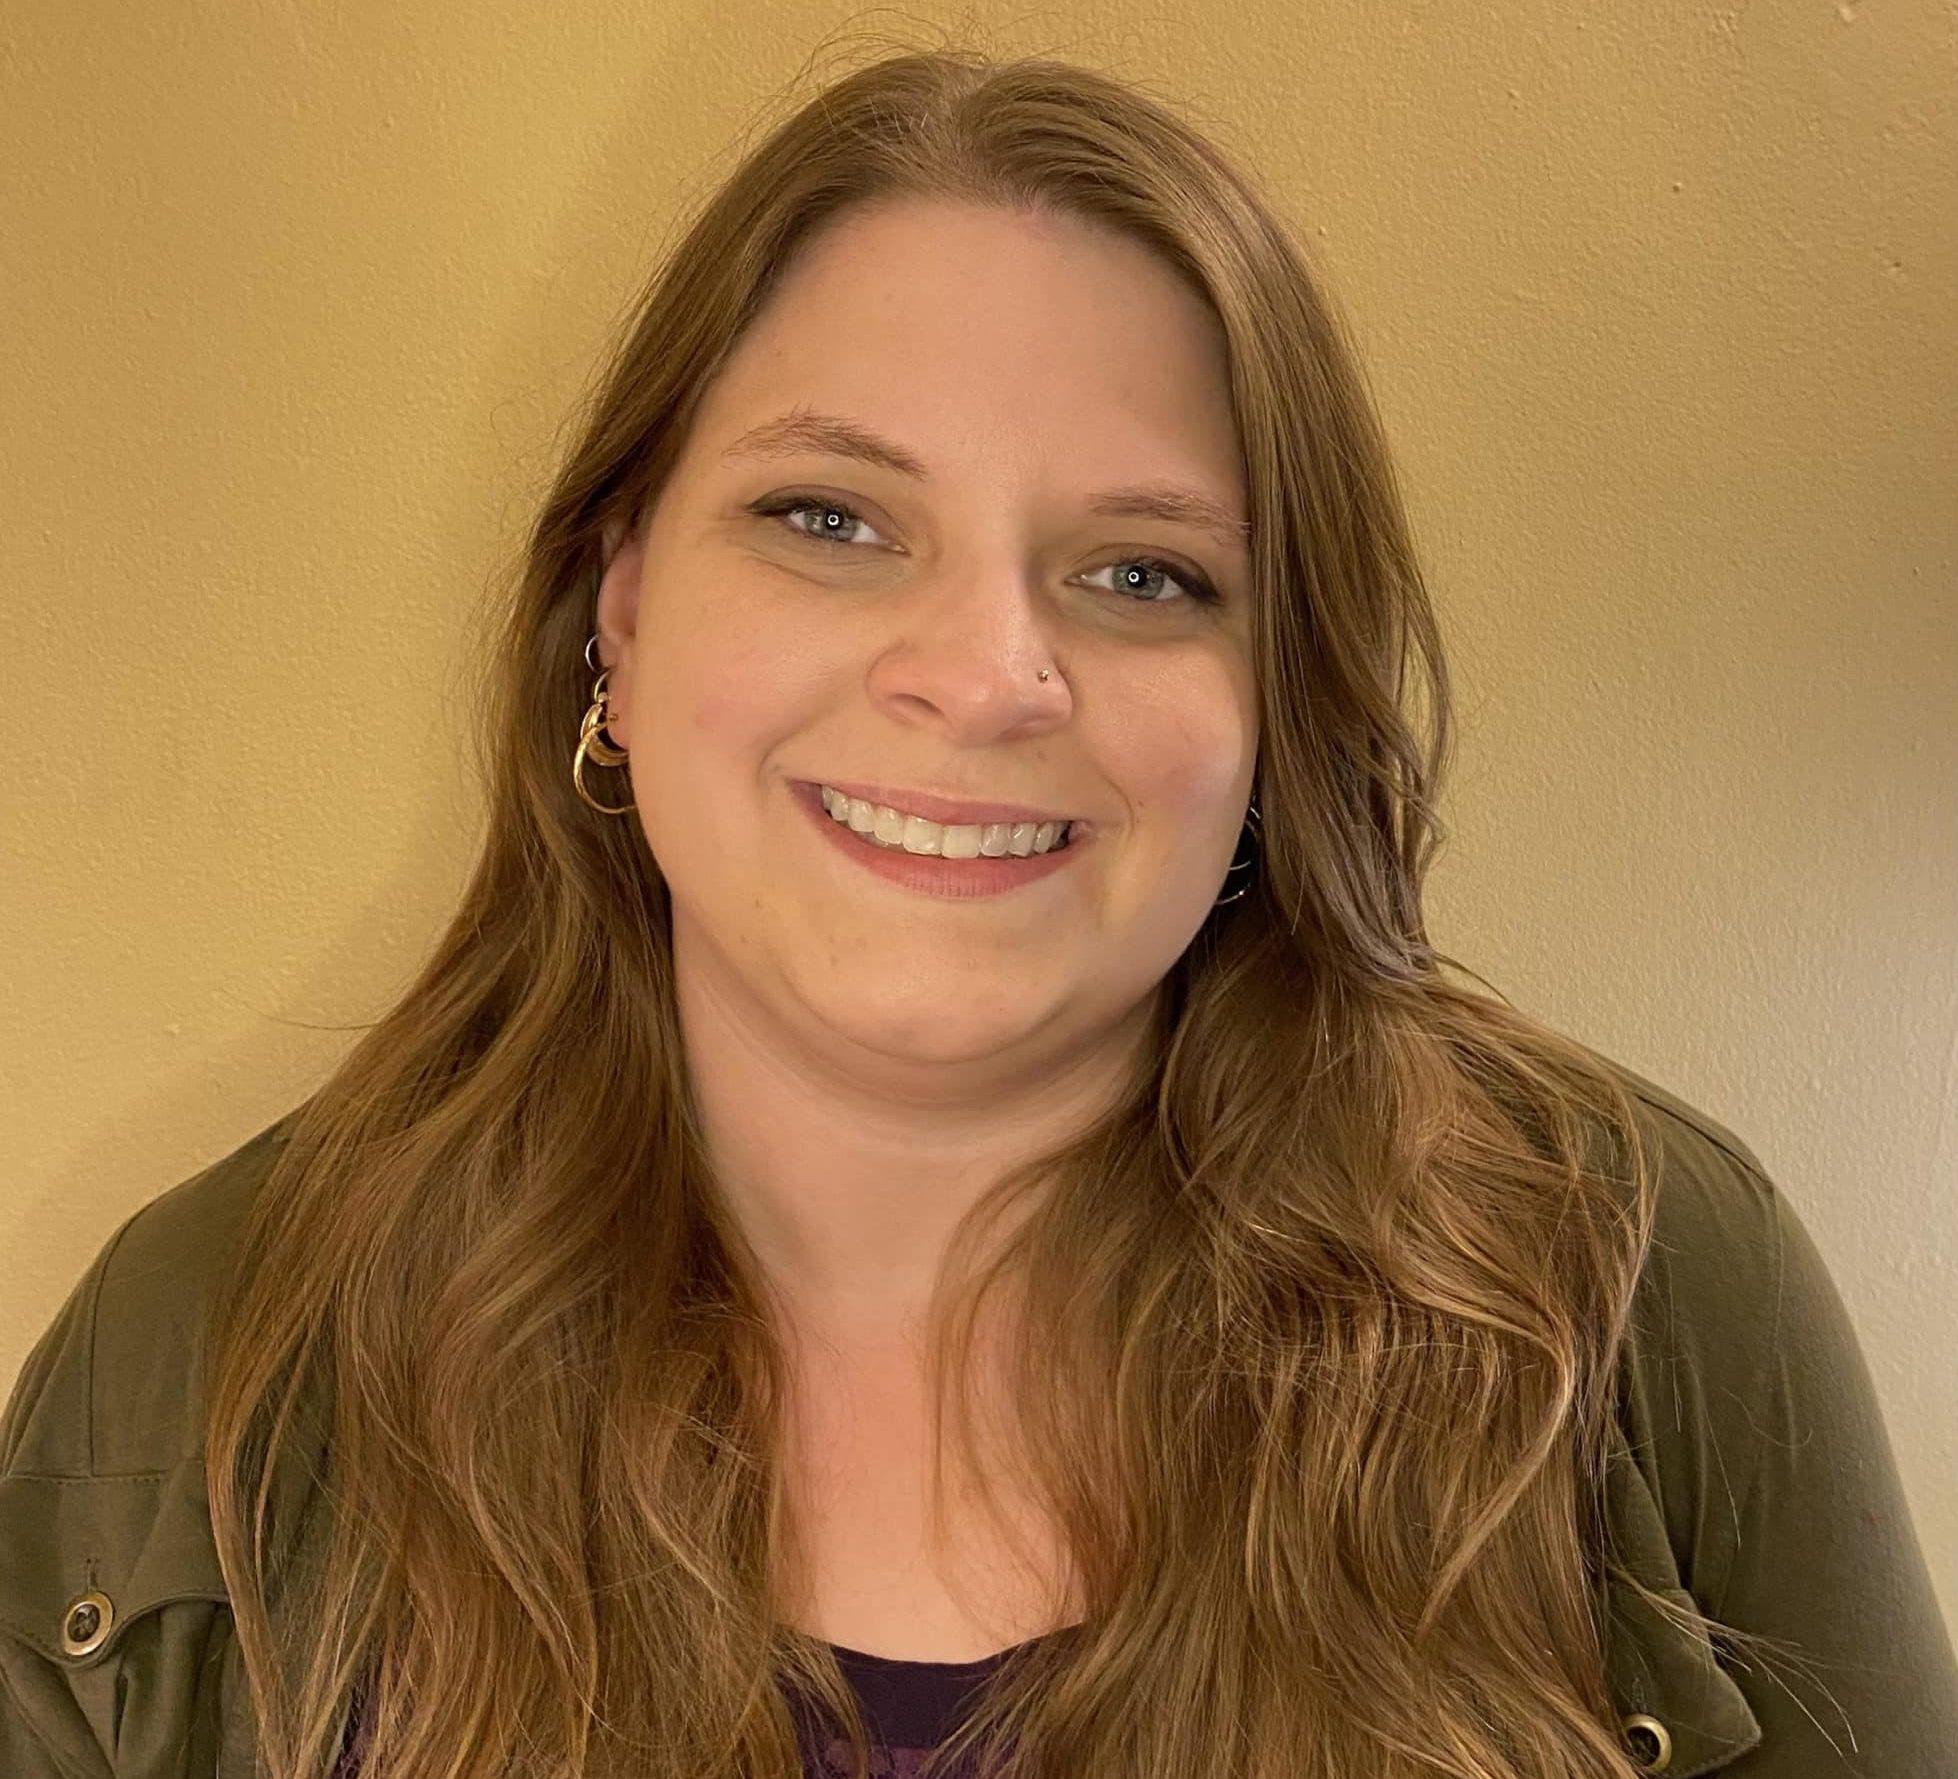 Justine Babcock pantry coordinator